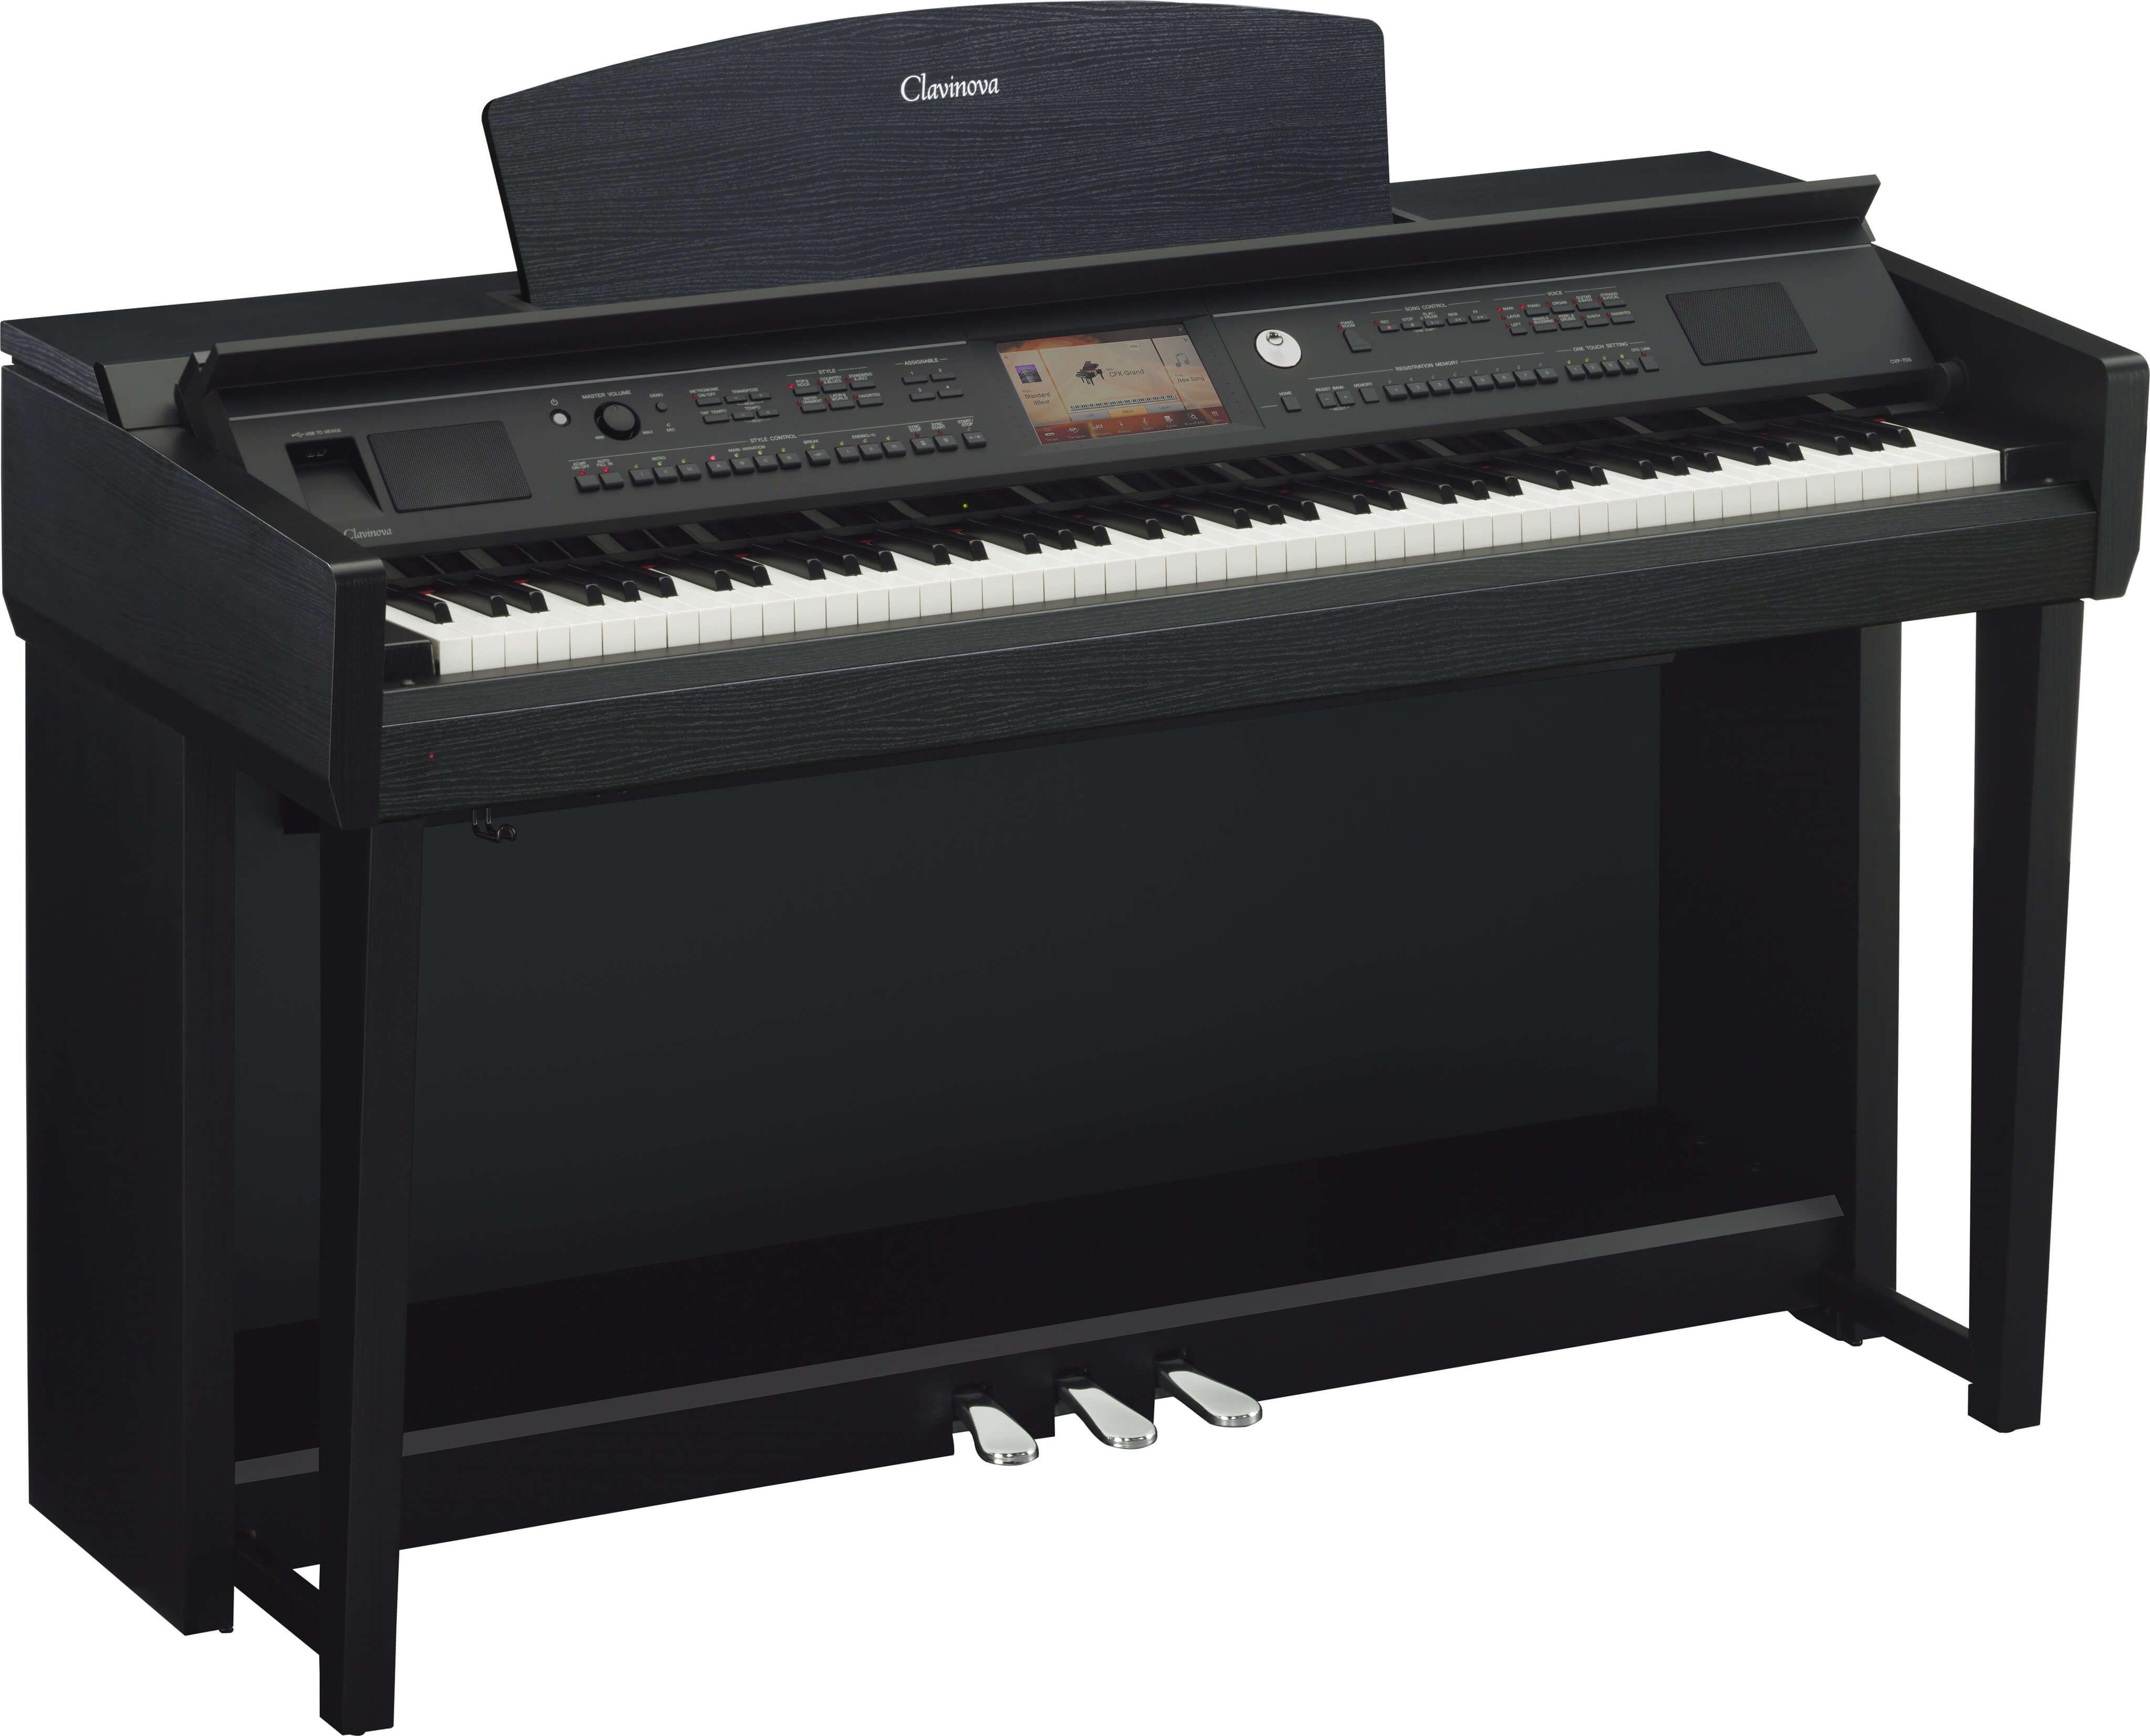 Piano Digital Yamaha CVP-705